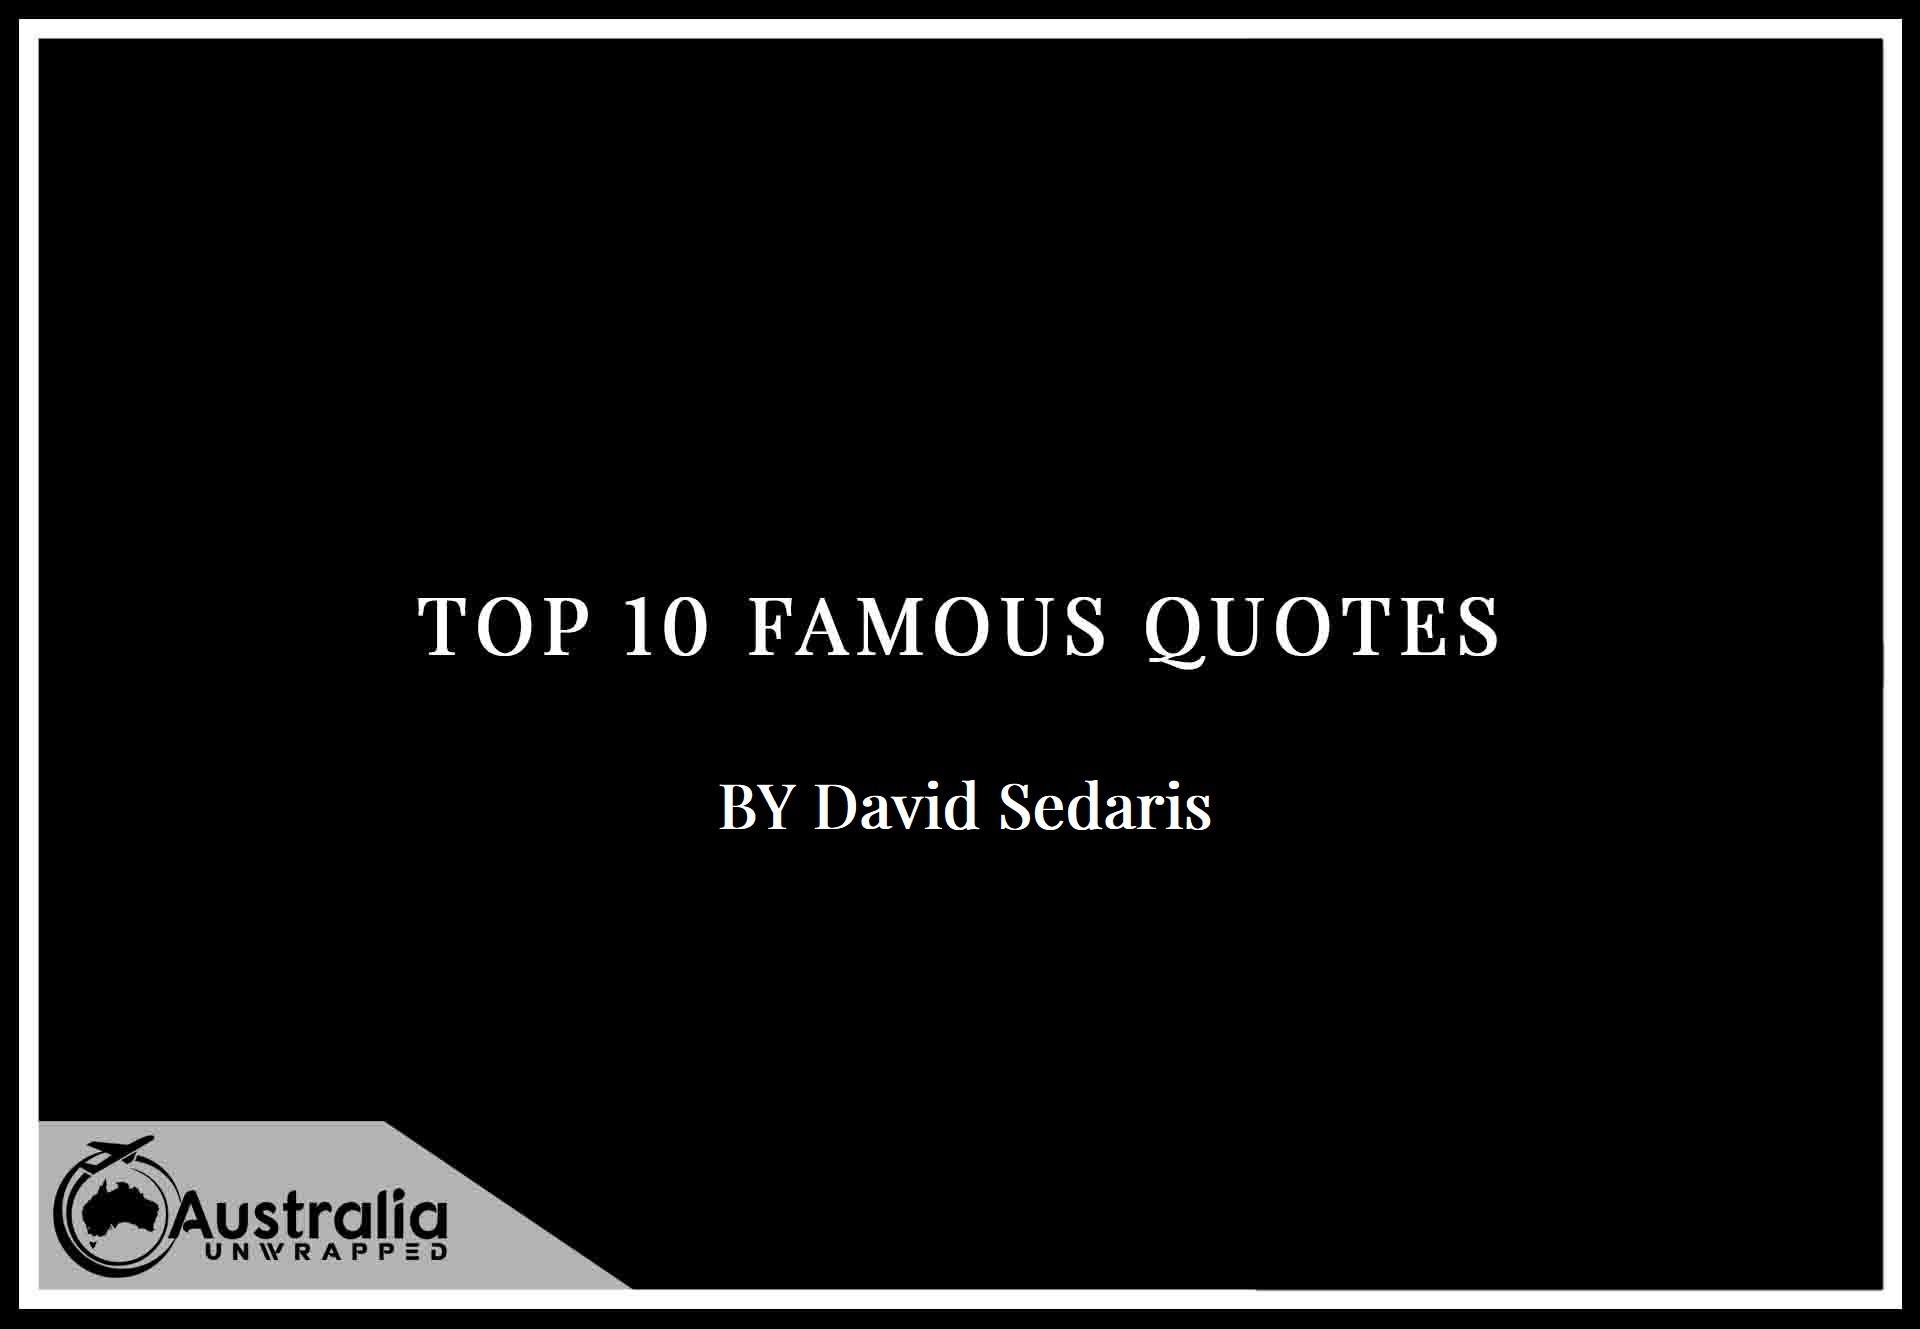 Top 10 Famous Quotes by Author David Sedaris